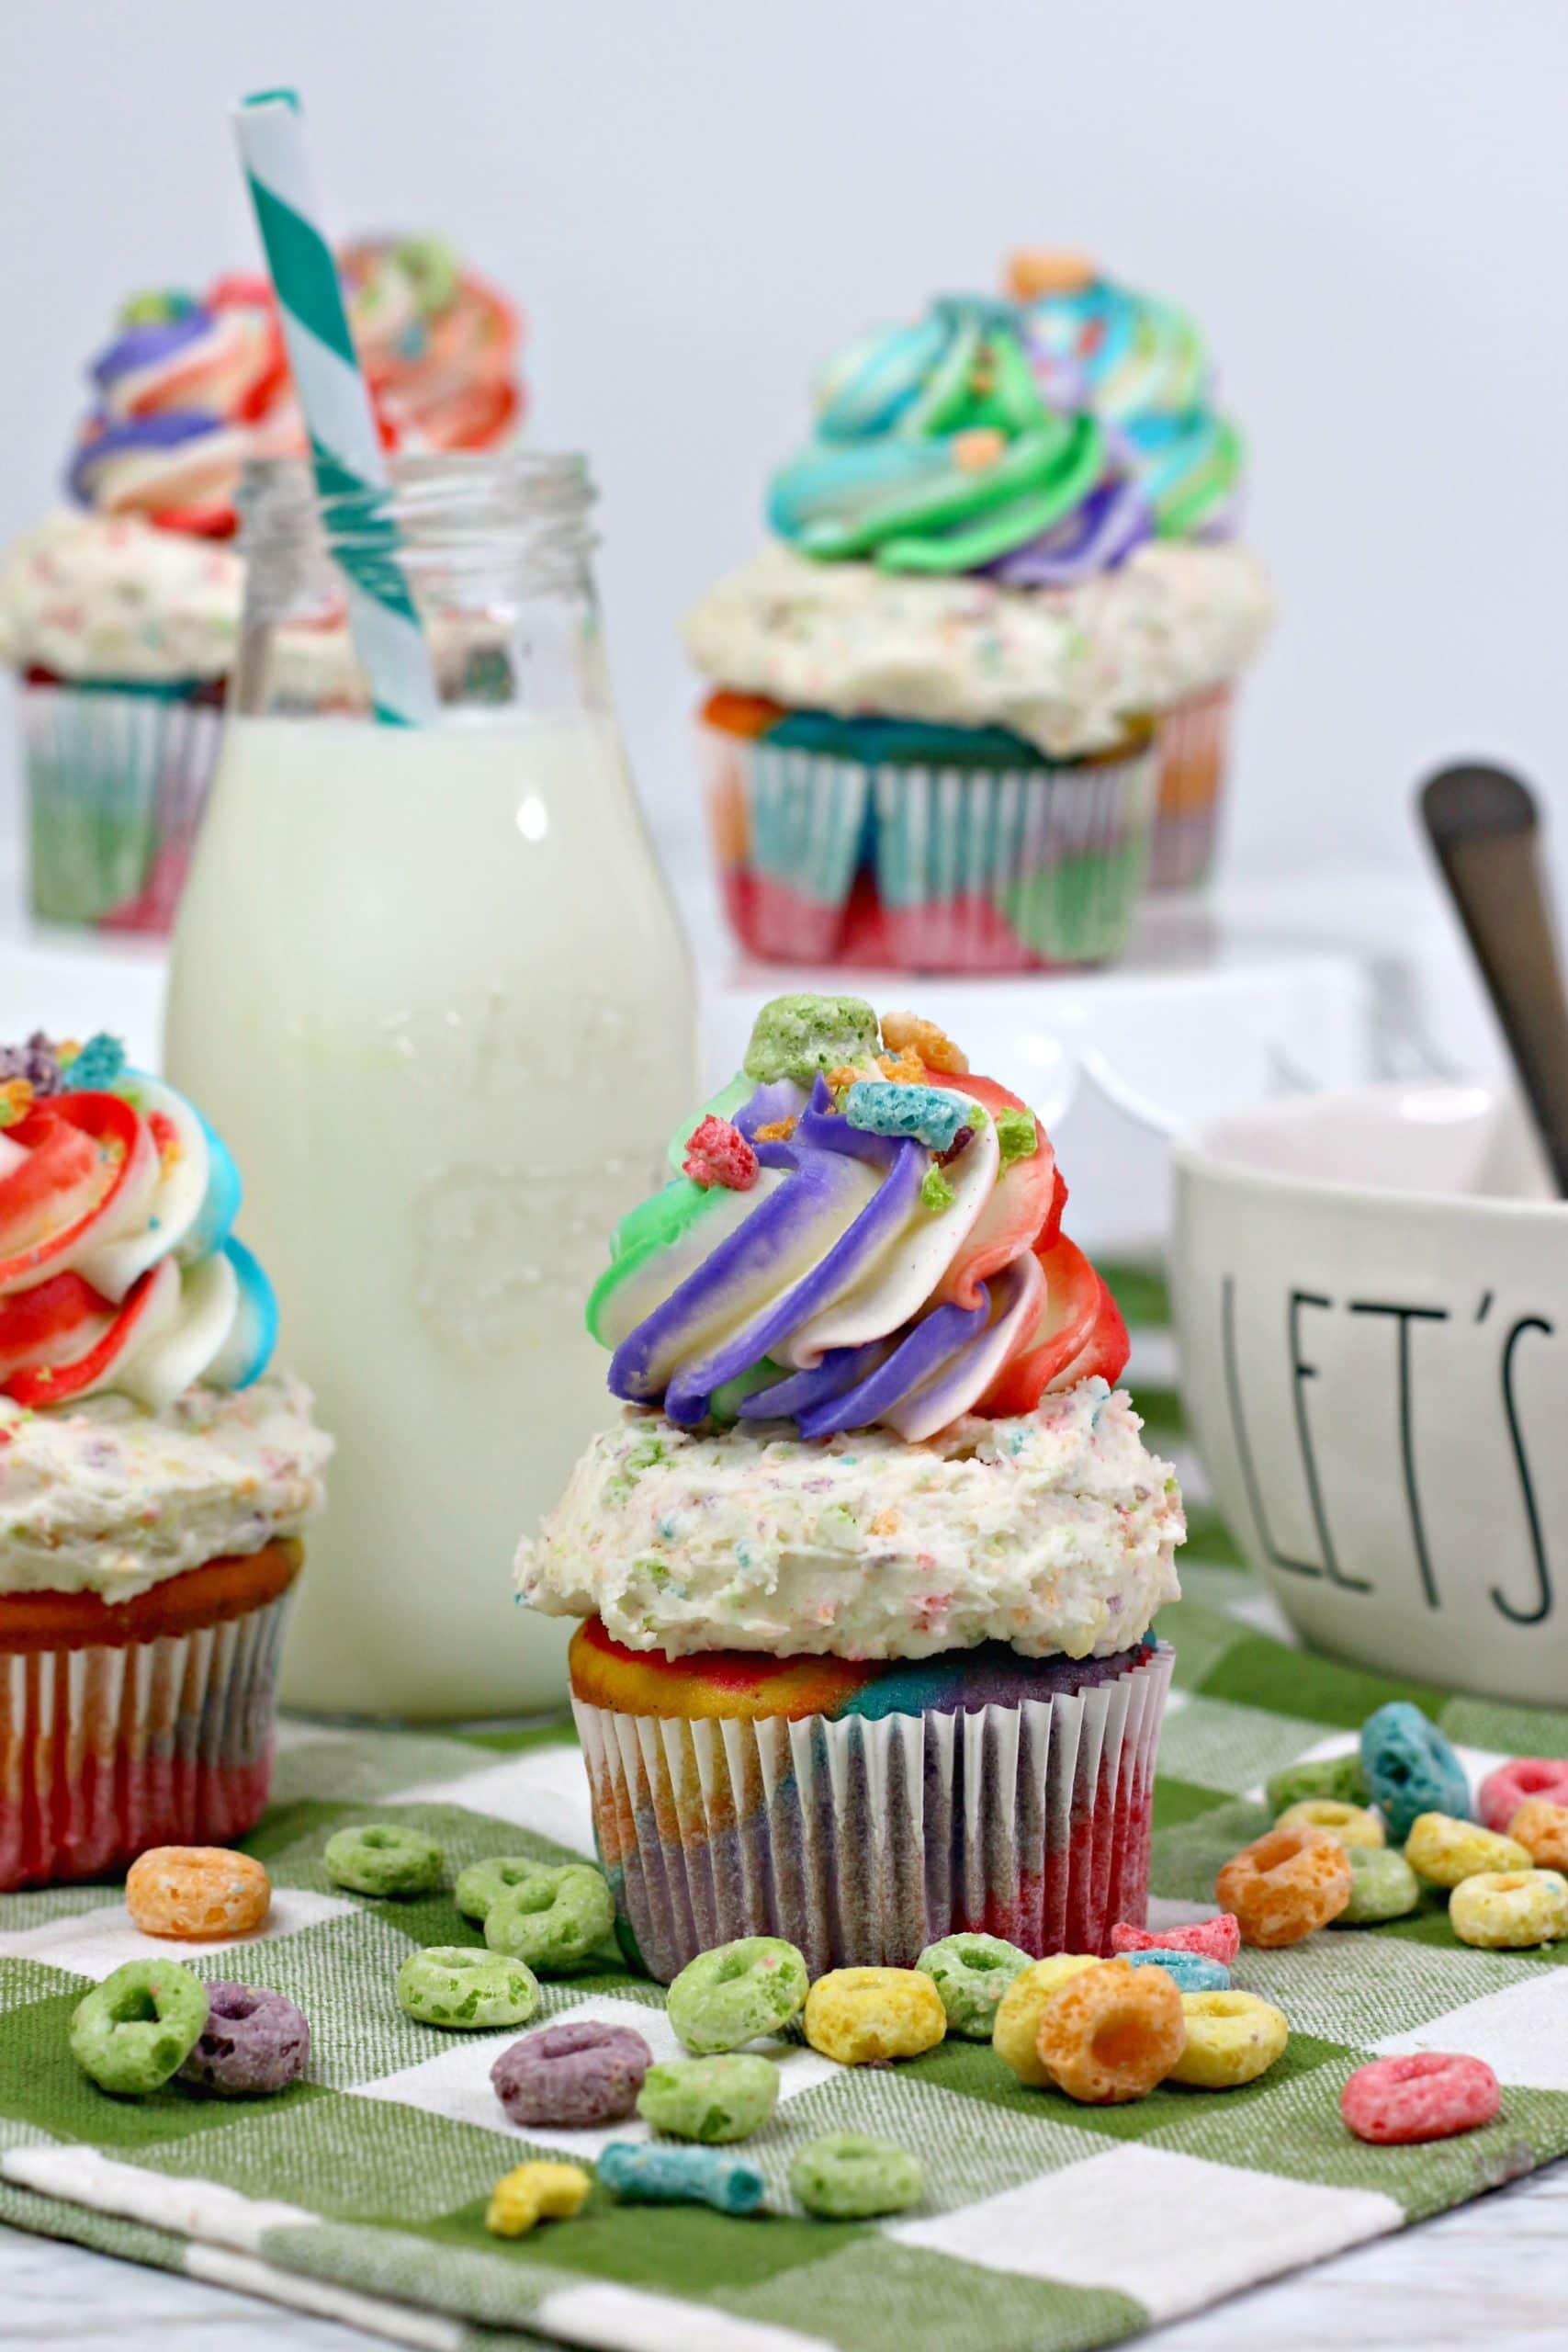 Fruit Loop Rainbow Cupcakes Recipe: How to Make Rainbow Frosting 🌈